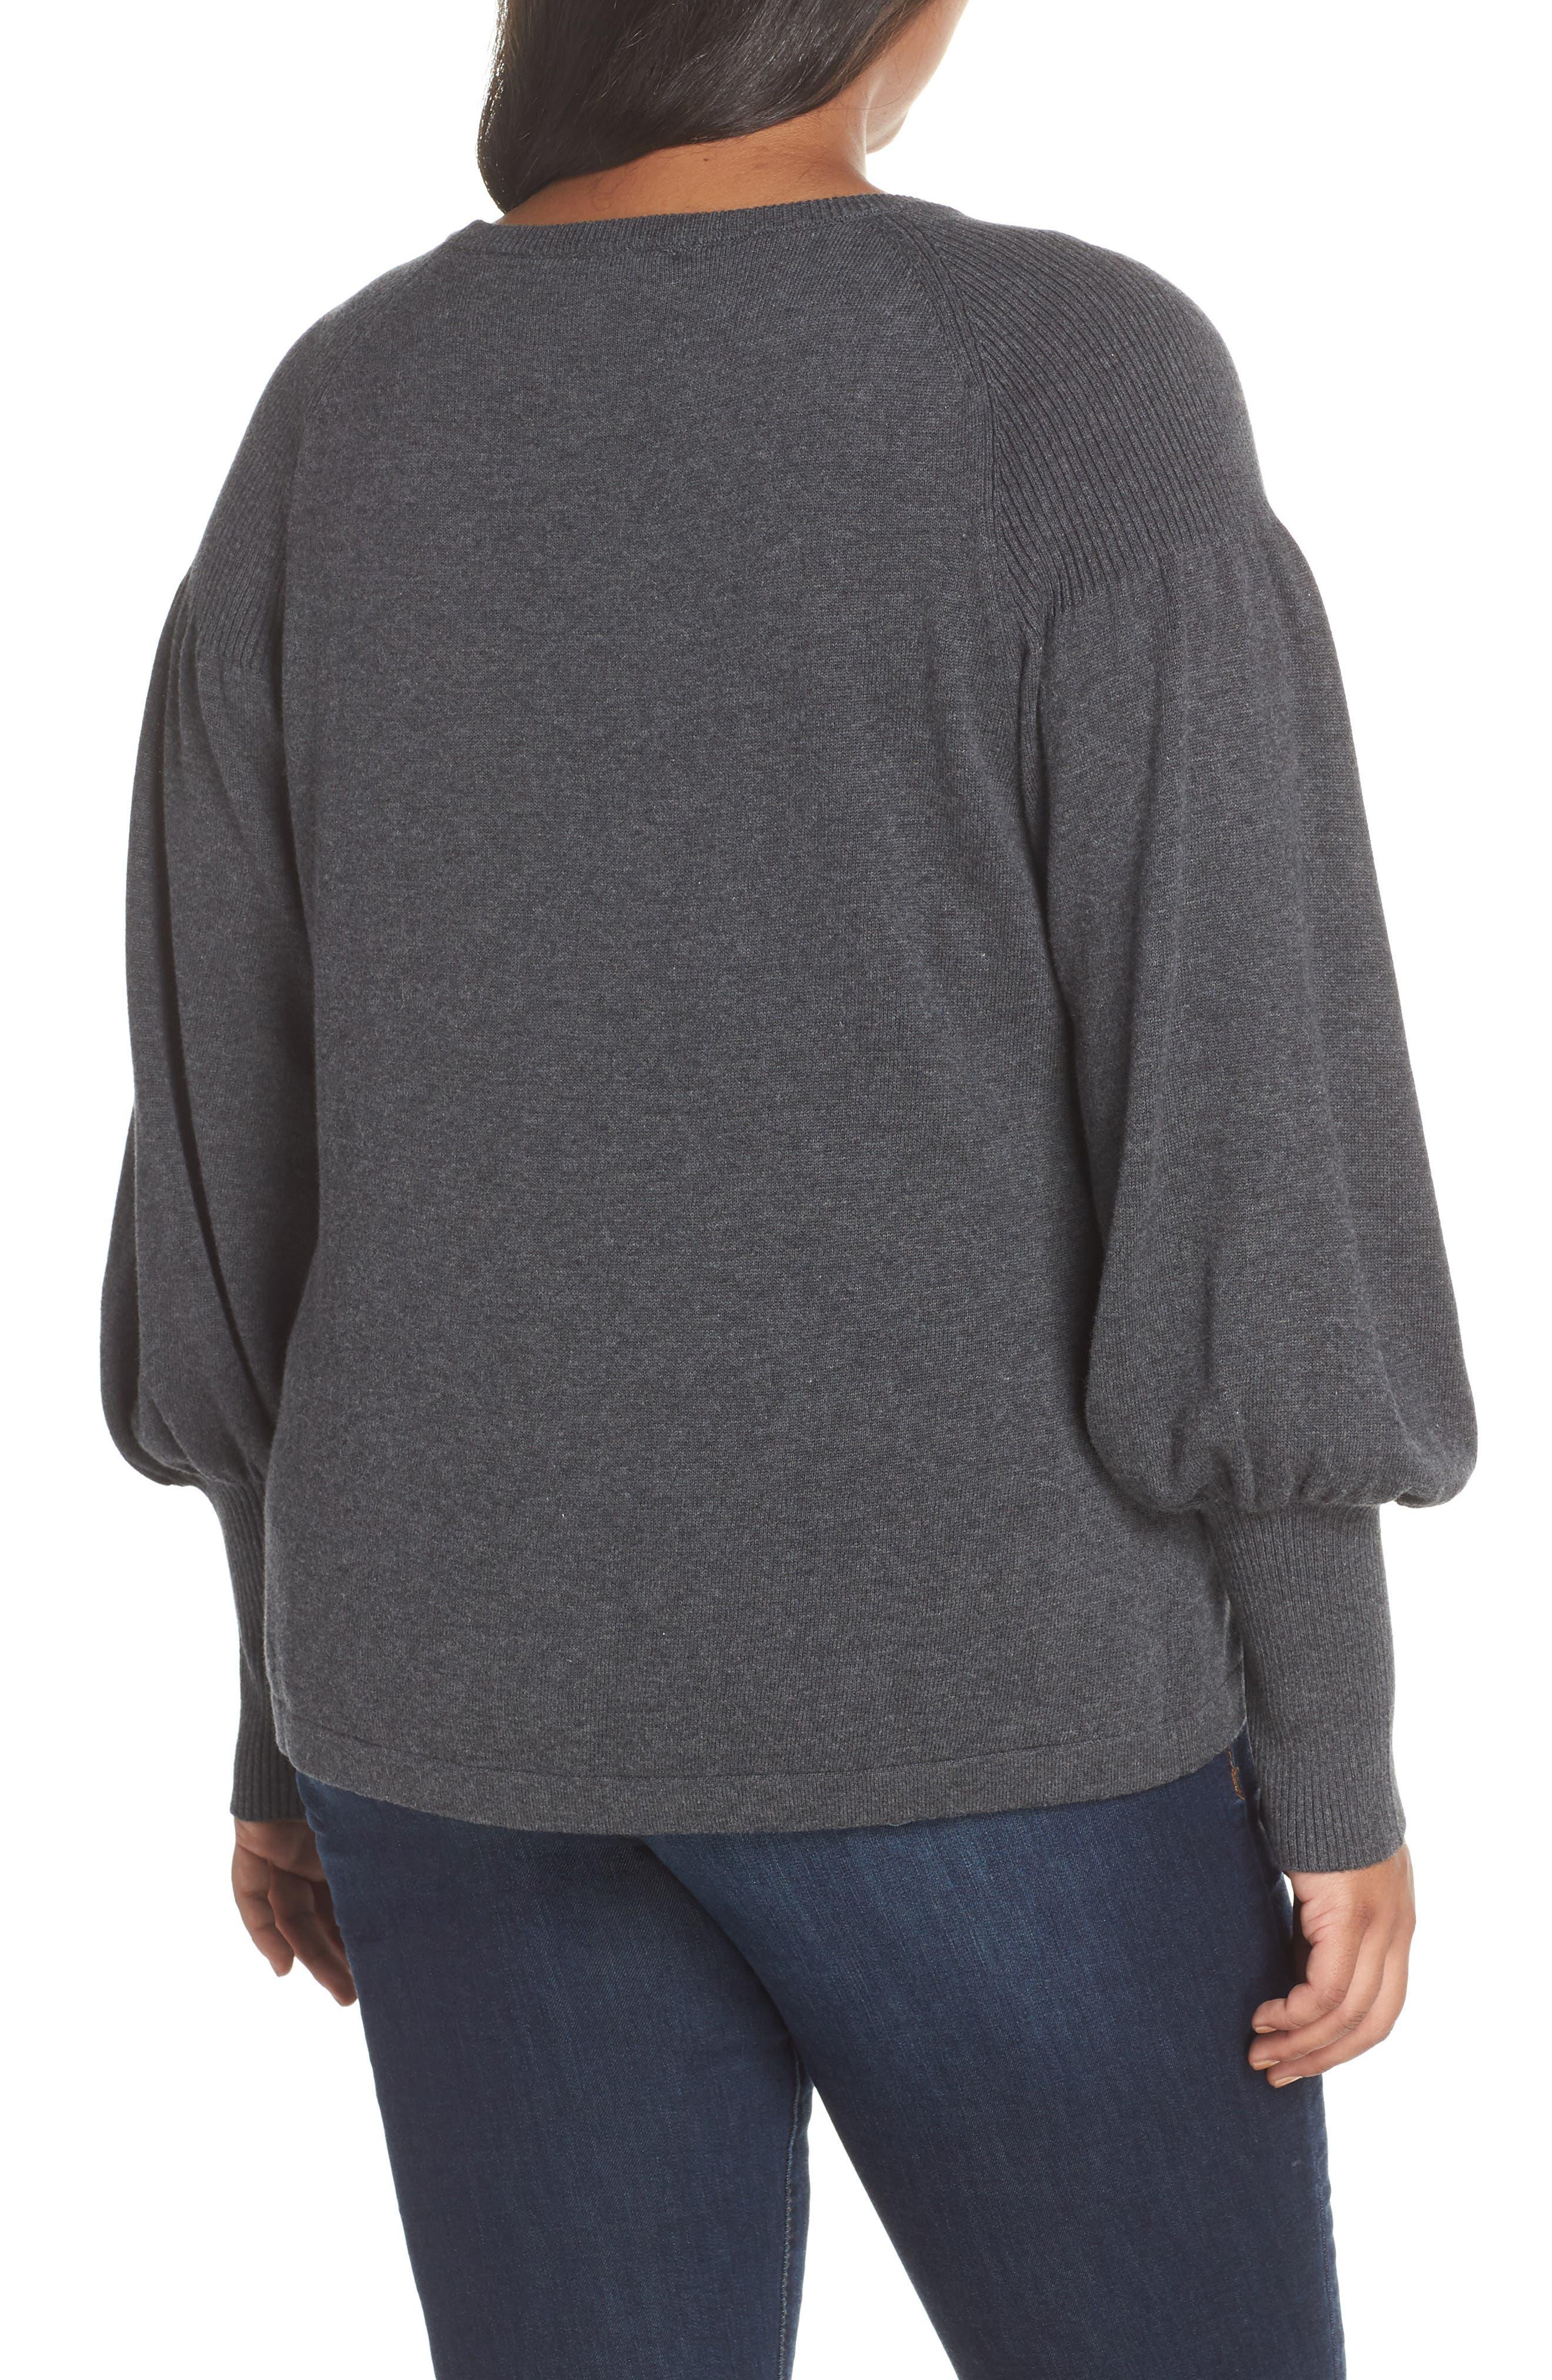 Blouson Sleeve Sweater,                             Alternate thumbnail 4, color,                             MED HEATHER GREY